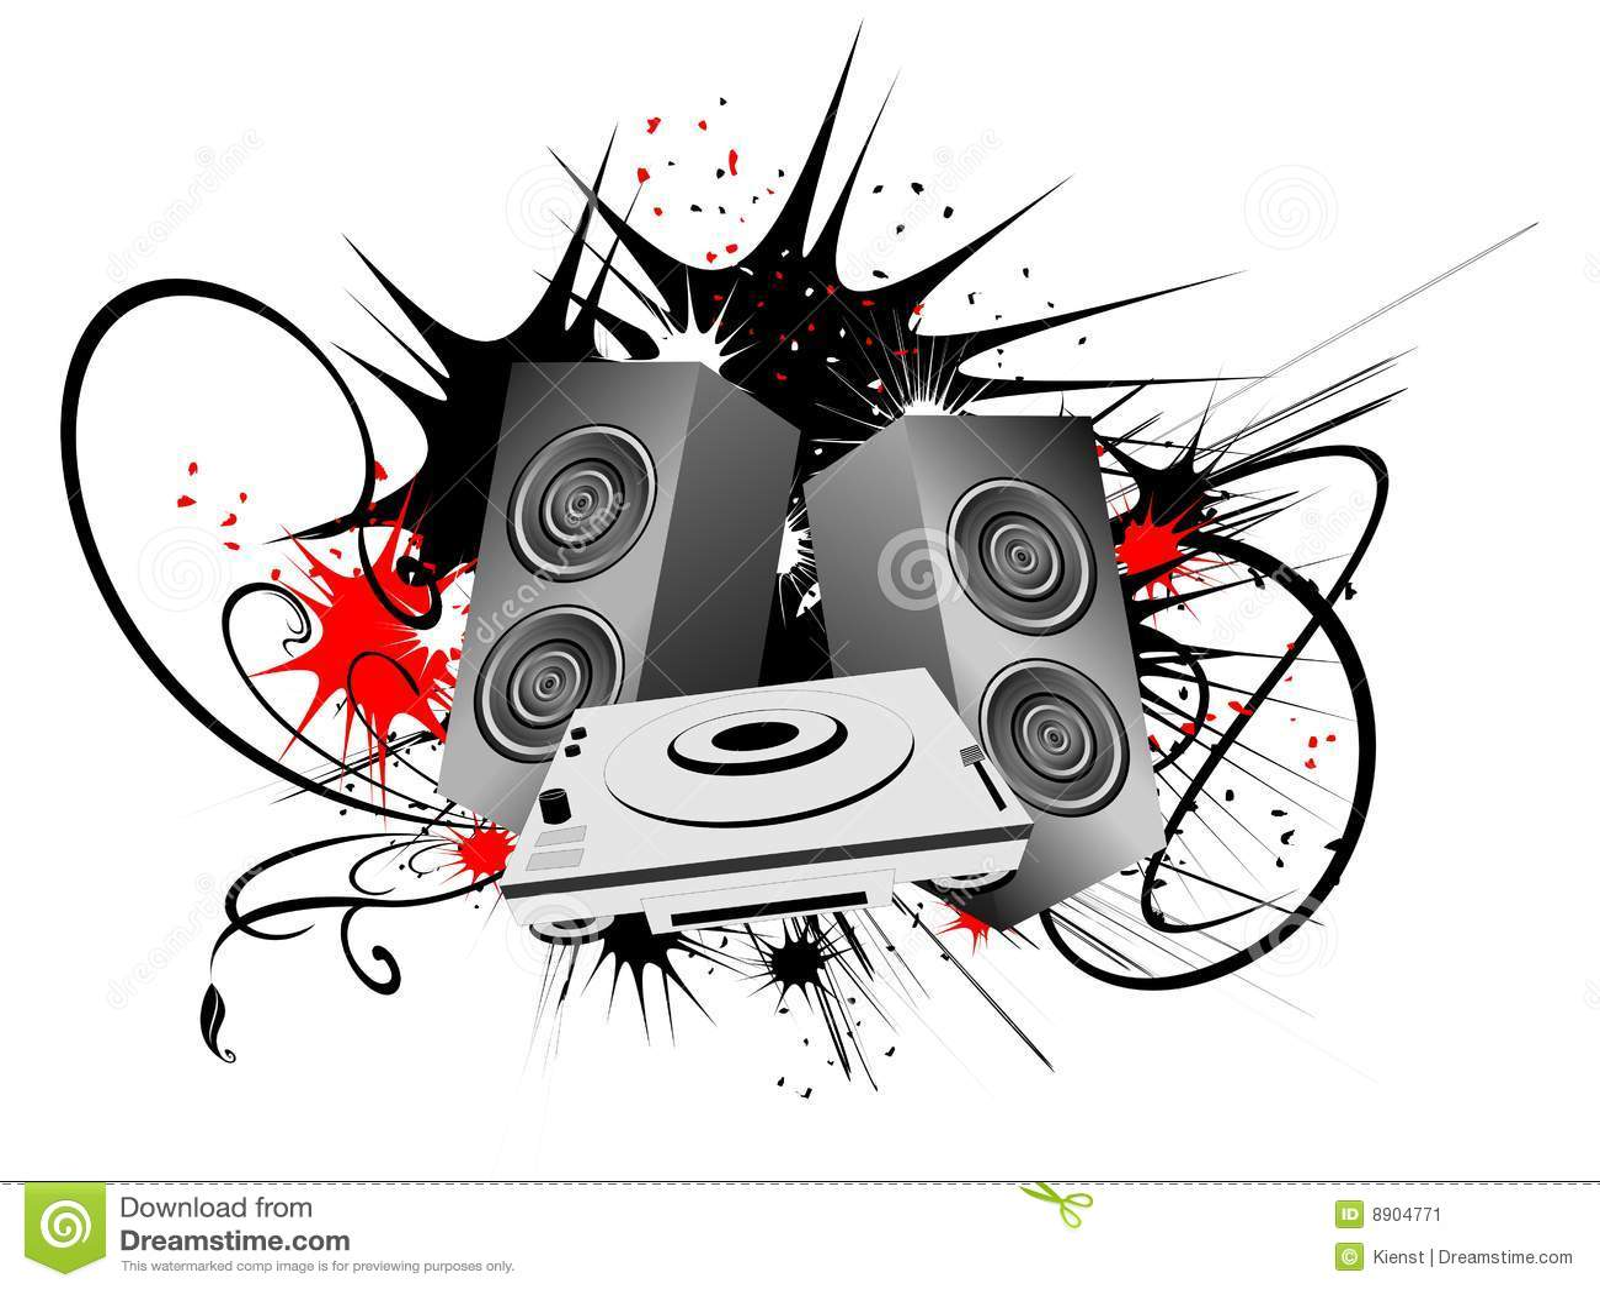 speakers art. royalty-free stock photo. download urban art with speaker speakers 6